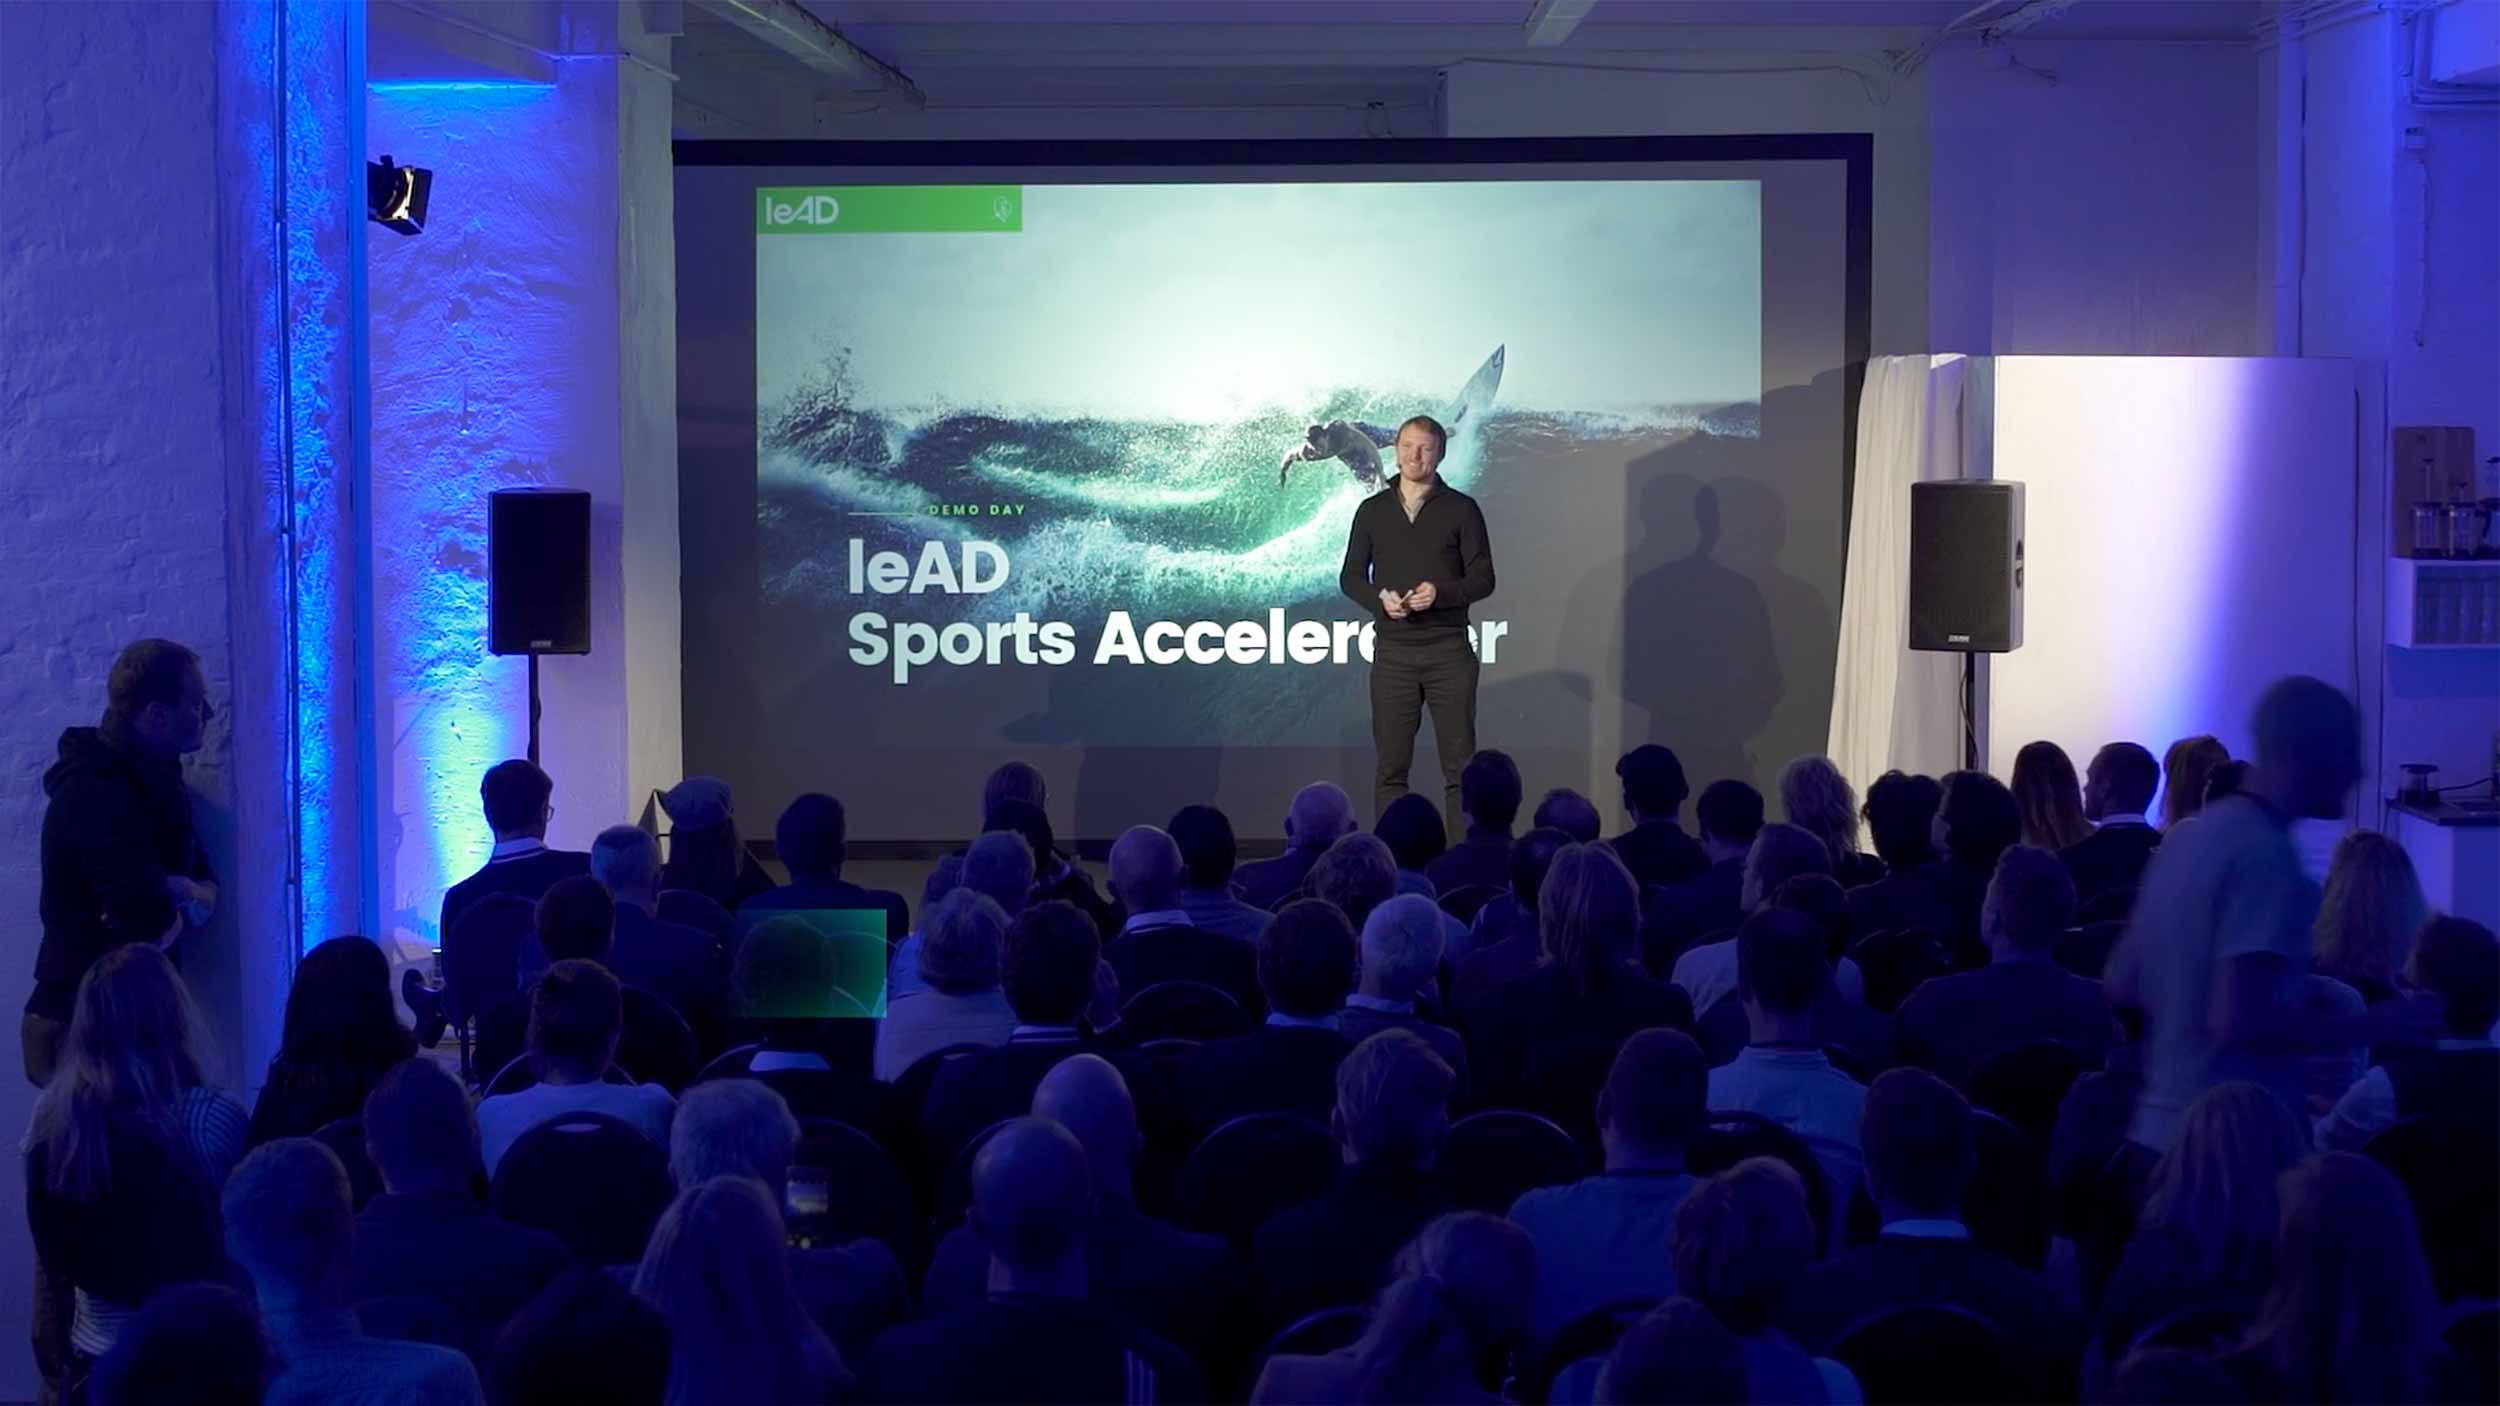 leAD Sportsaccelerator: Adi Dassler